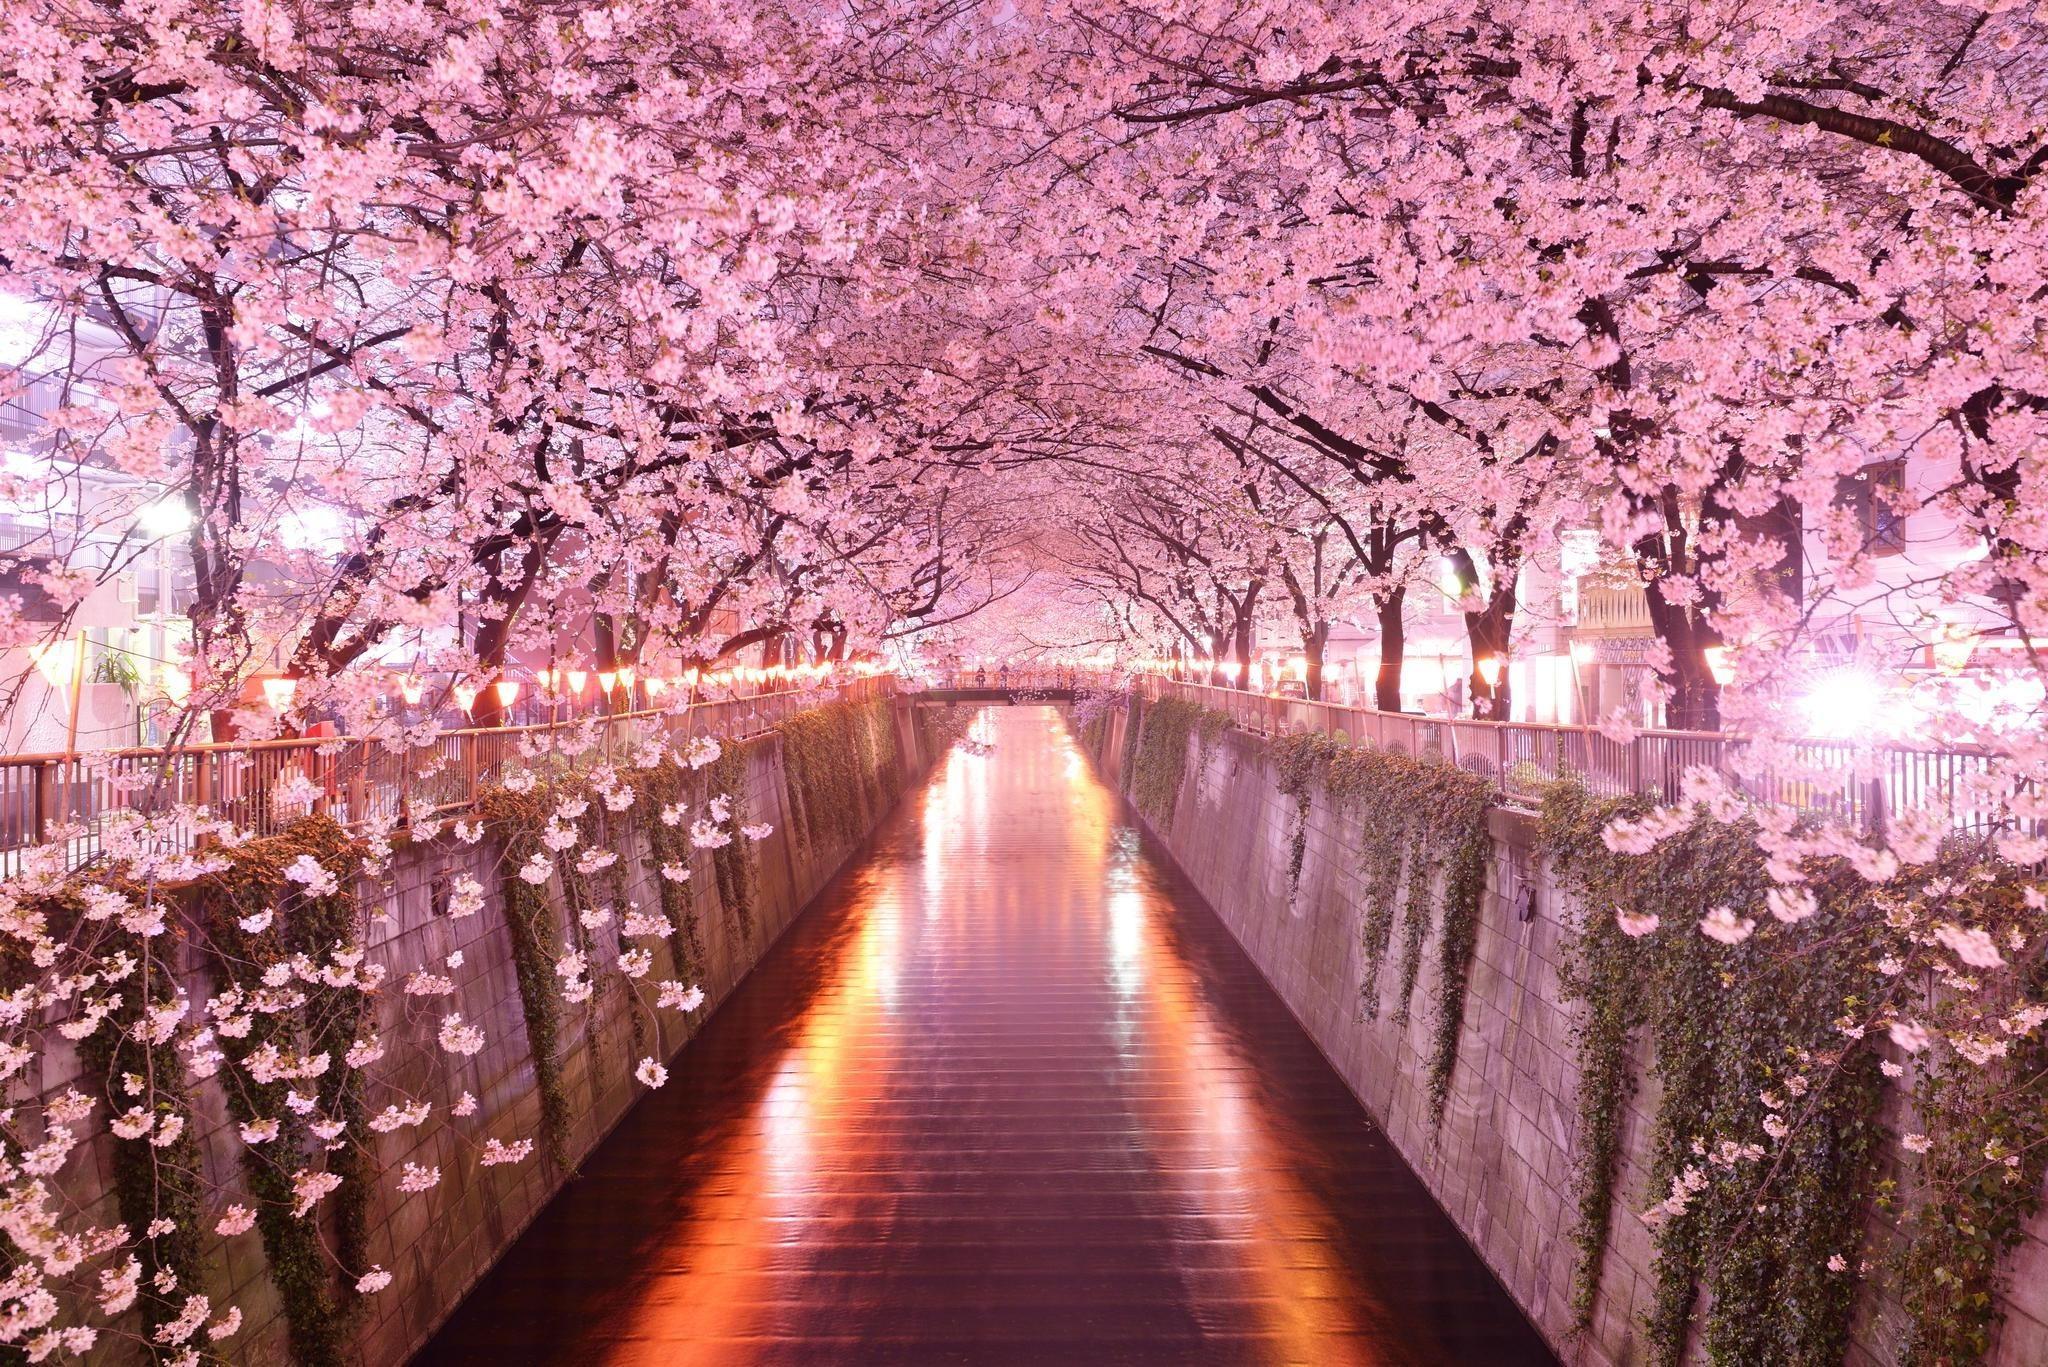 Pink Aesthetic Japan Wallpapers Wallpaper Cave